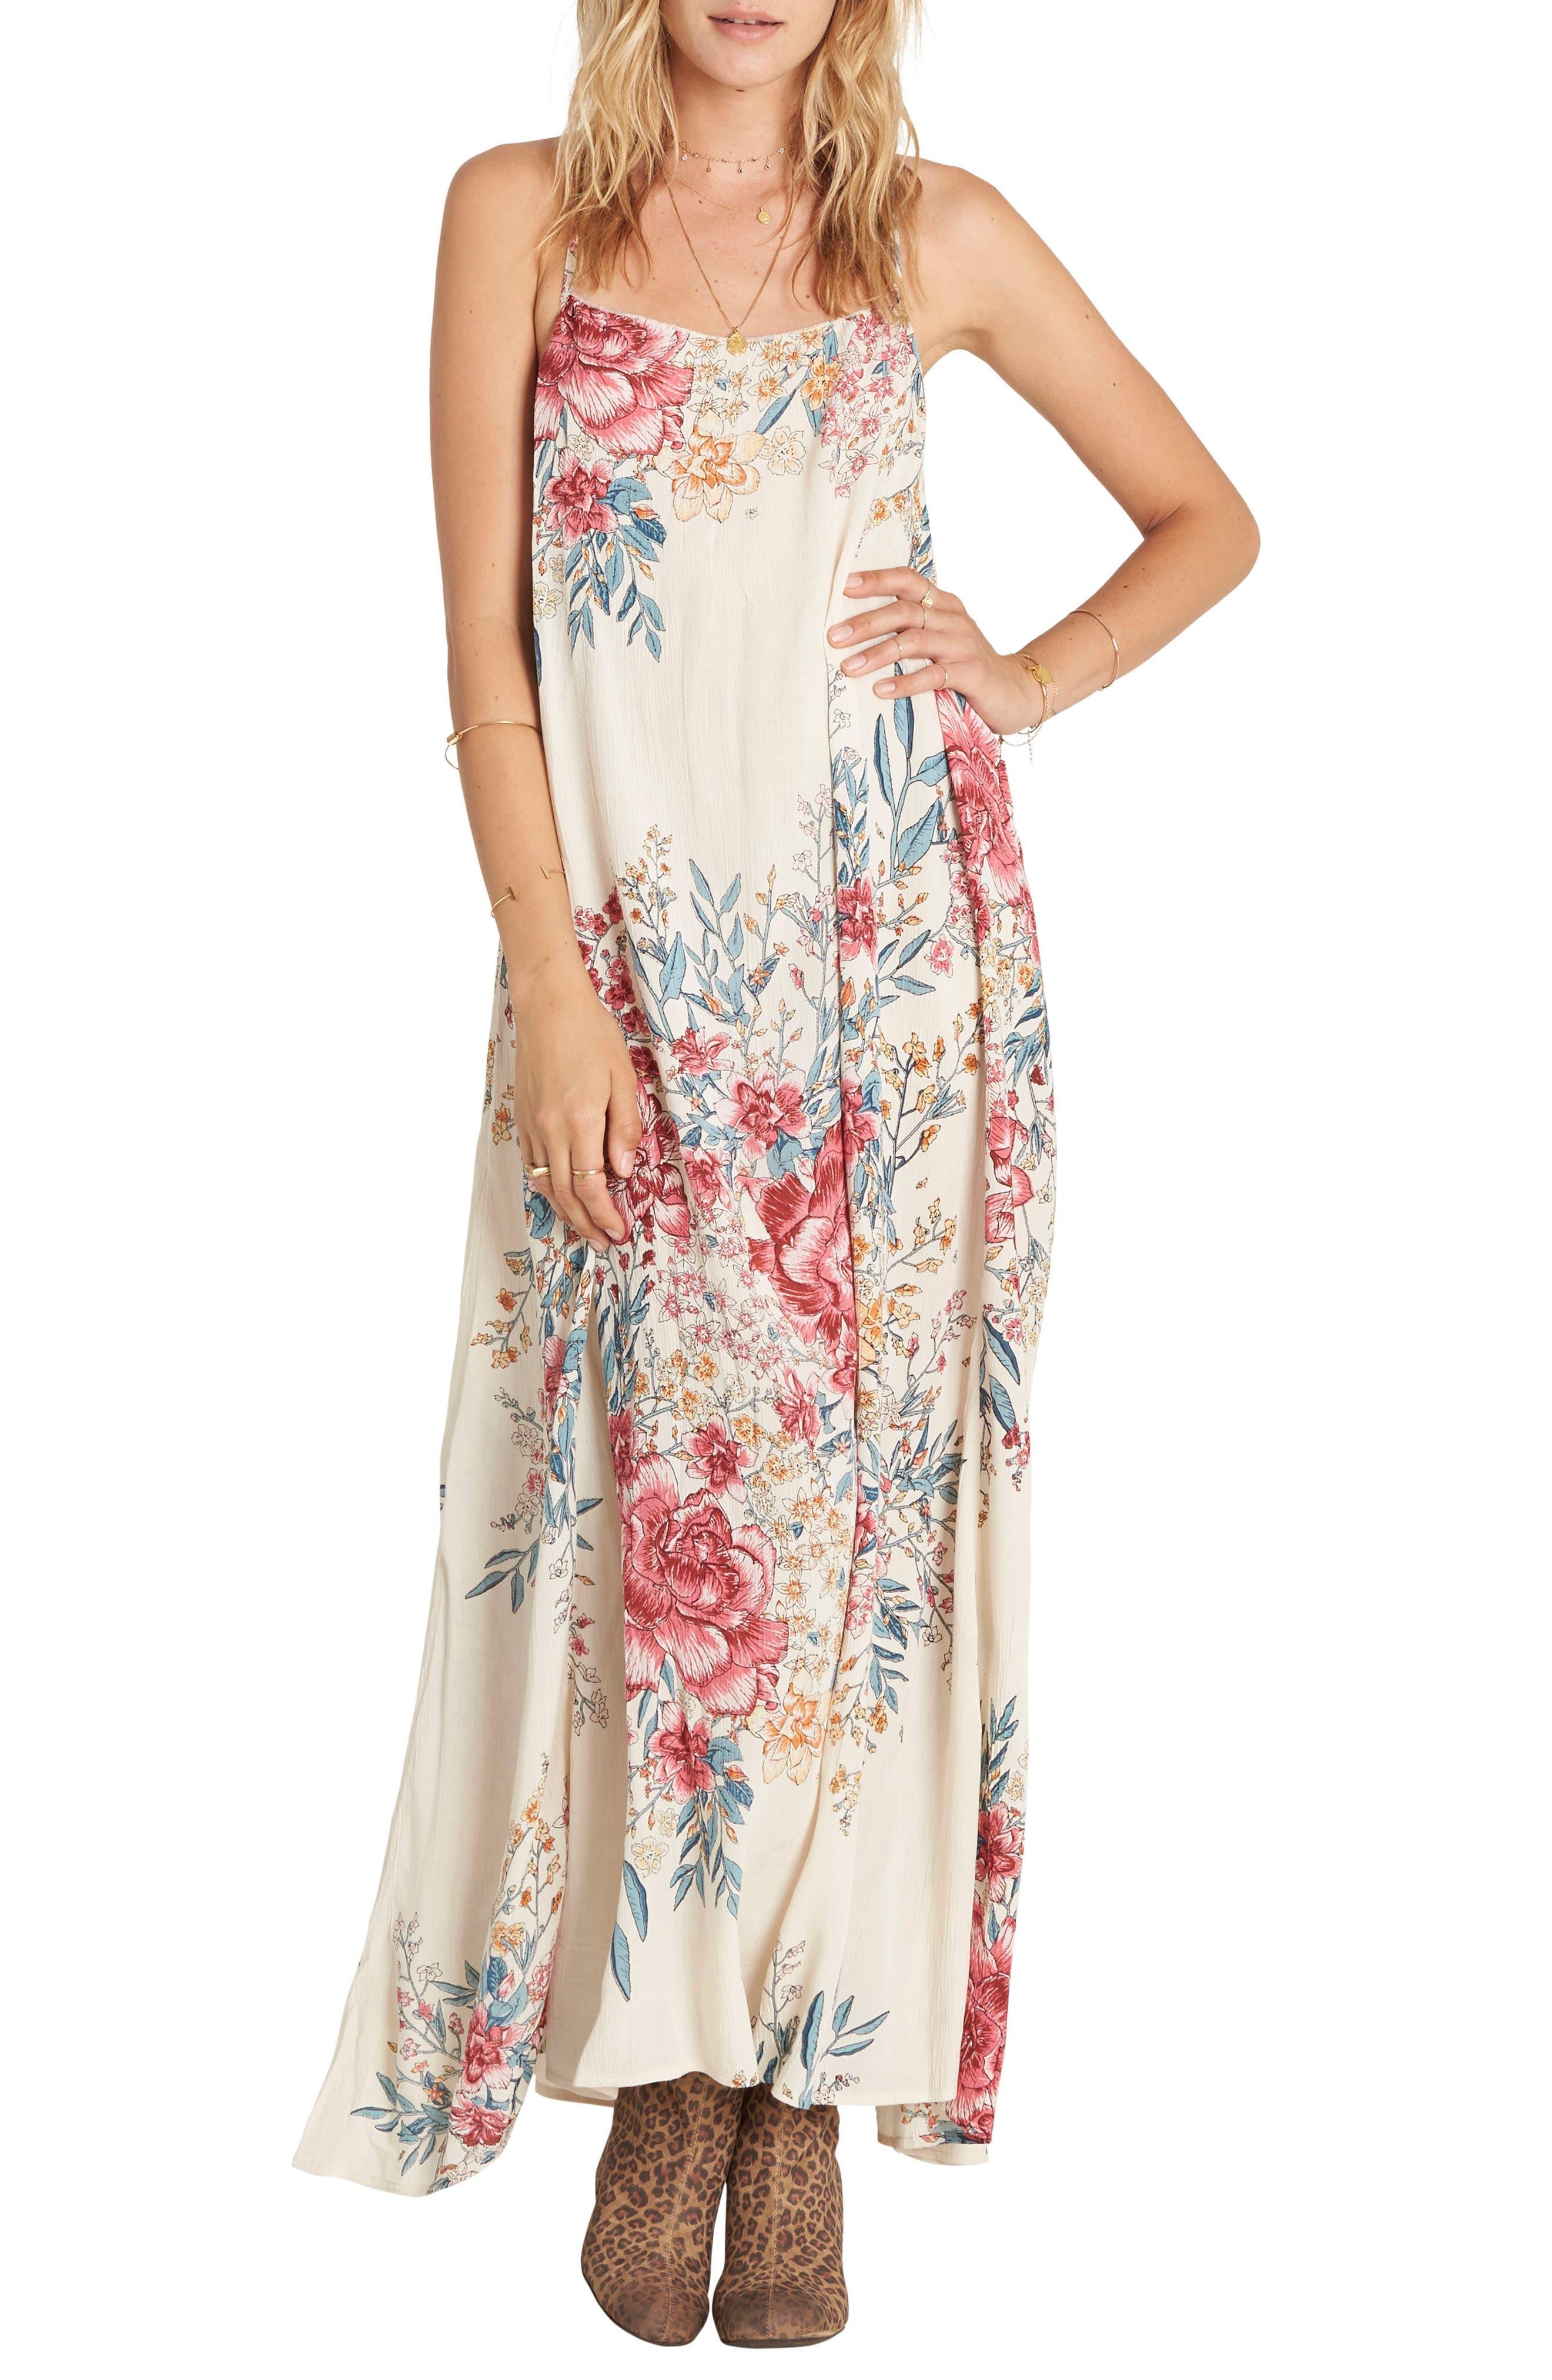 San Sebonne Floral Print Maxi Dress,                         Main,                         color, Ivory